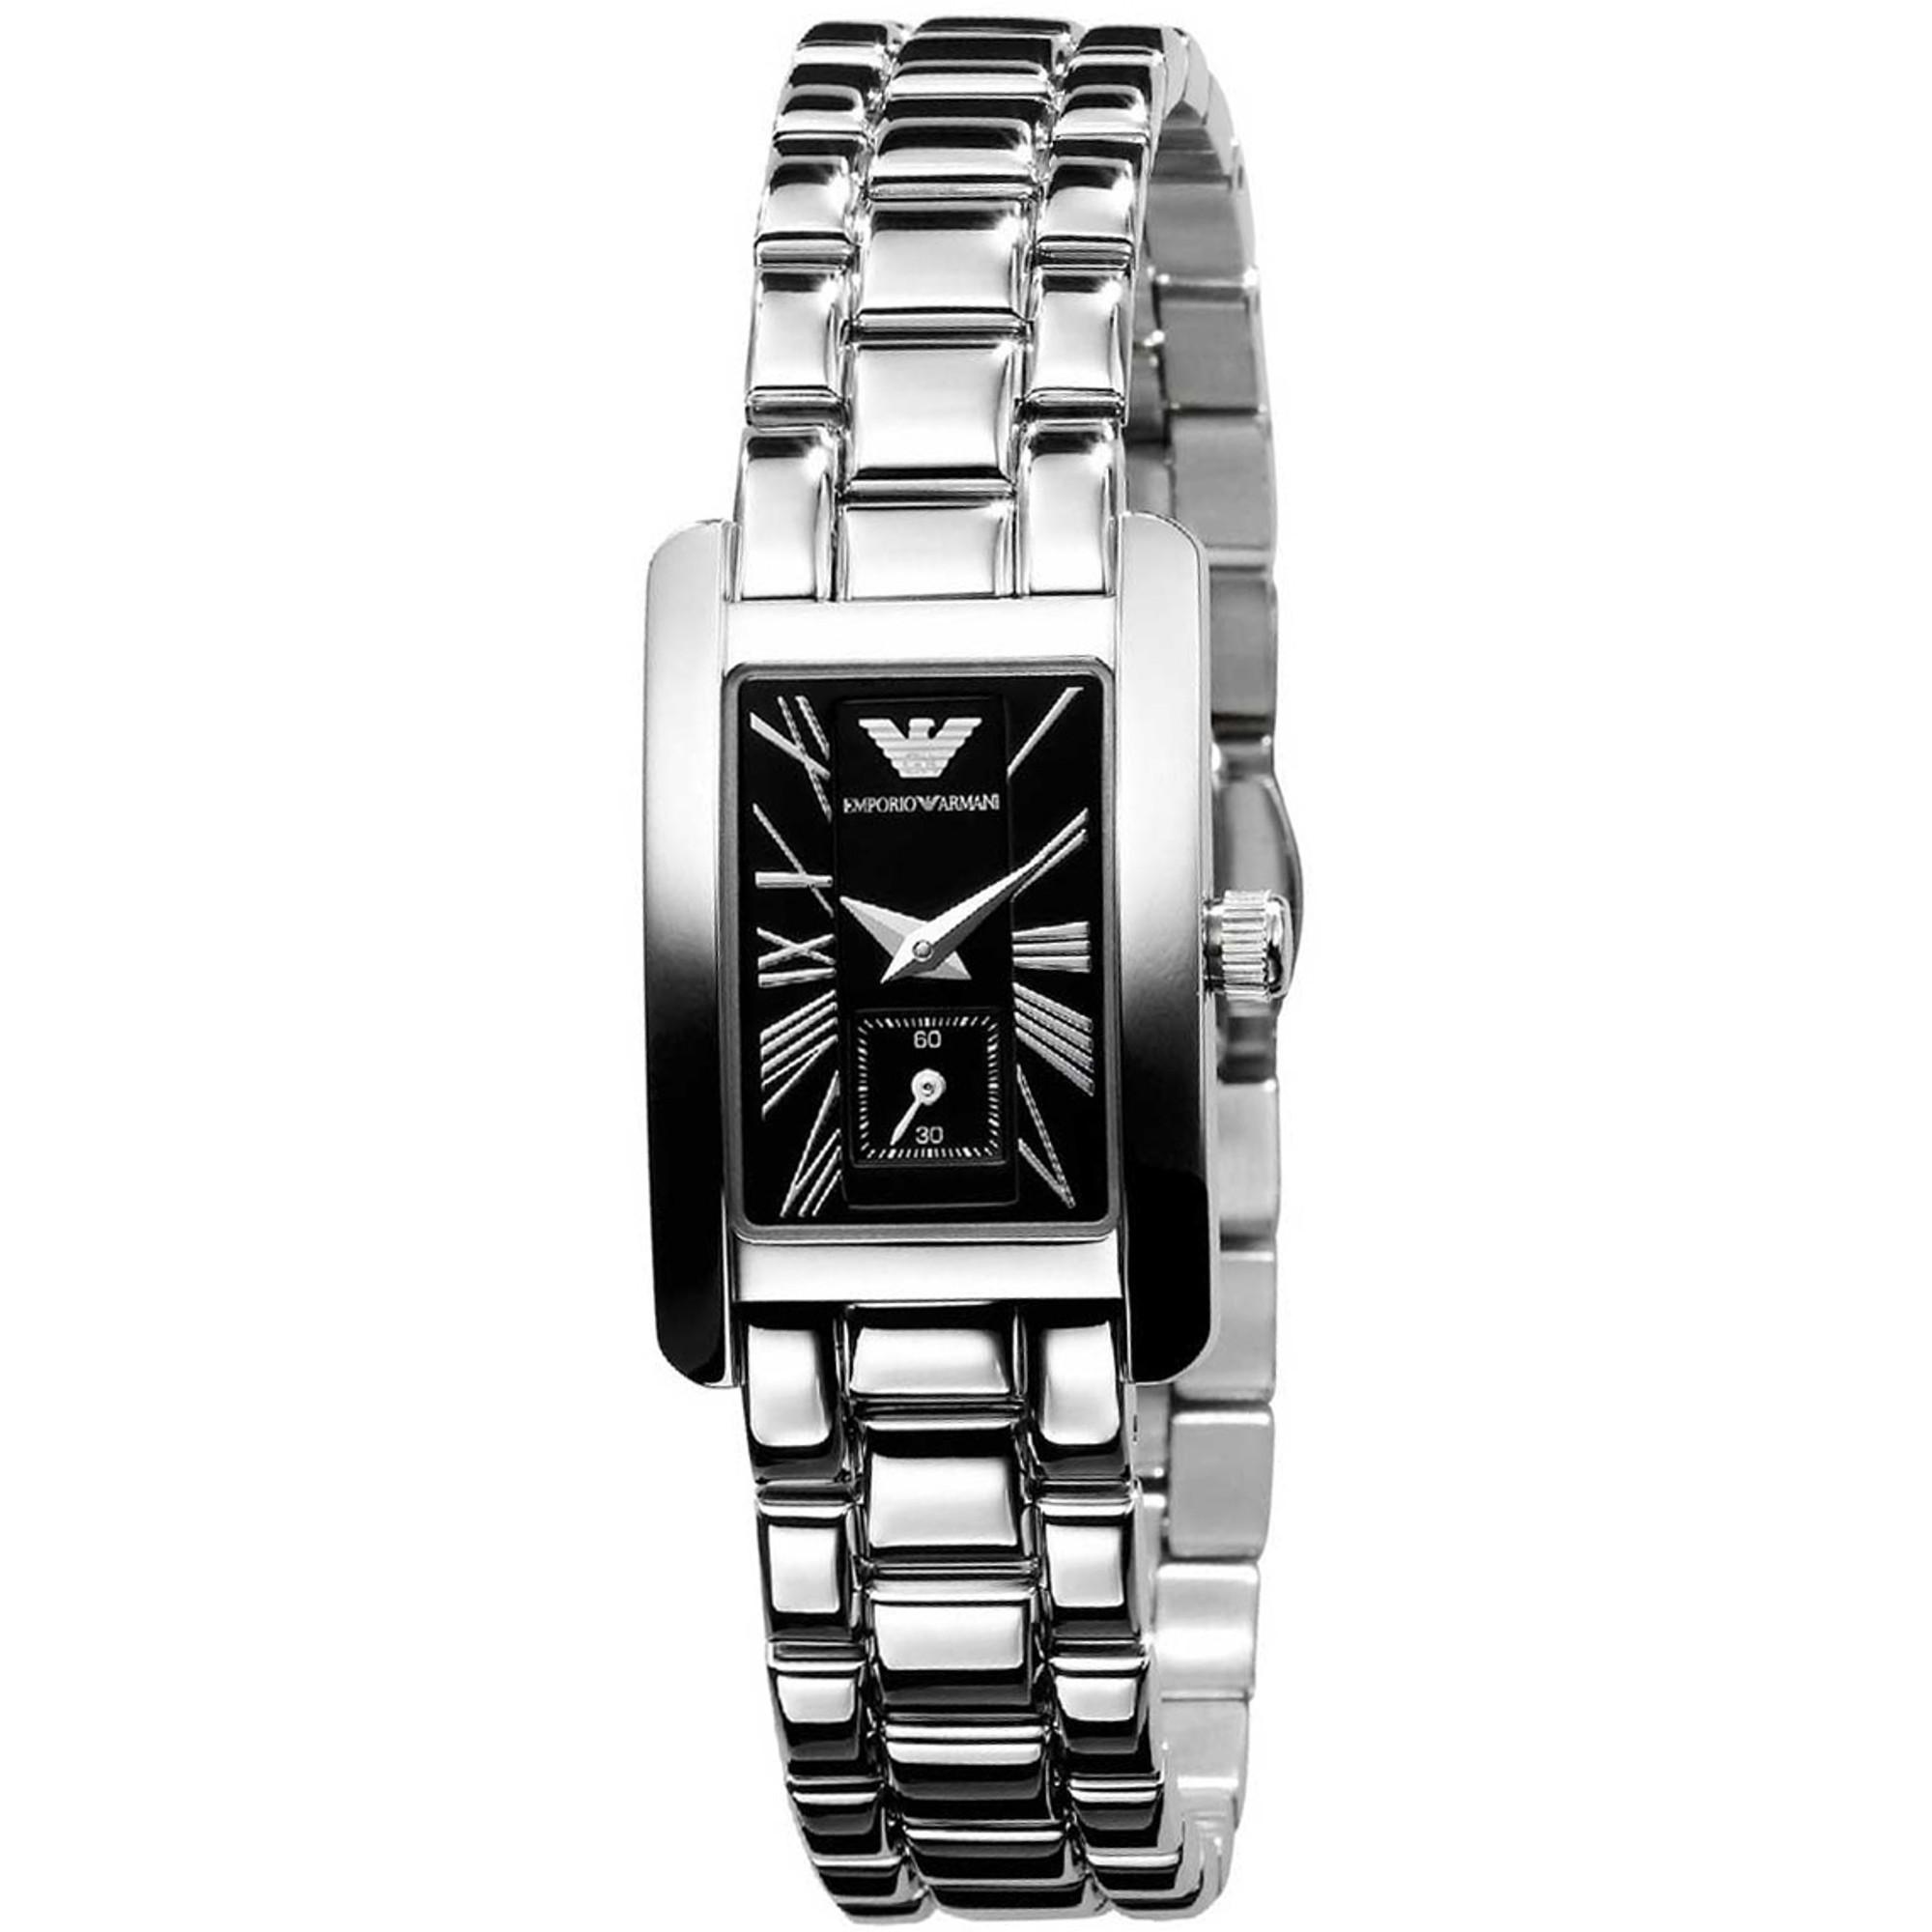 EMPORIO ARMANI Classic Watch AR0157